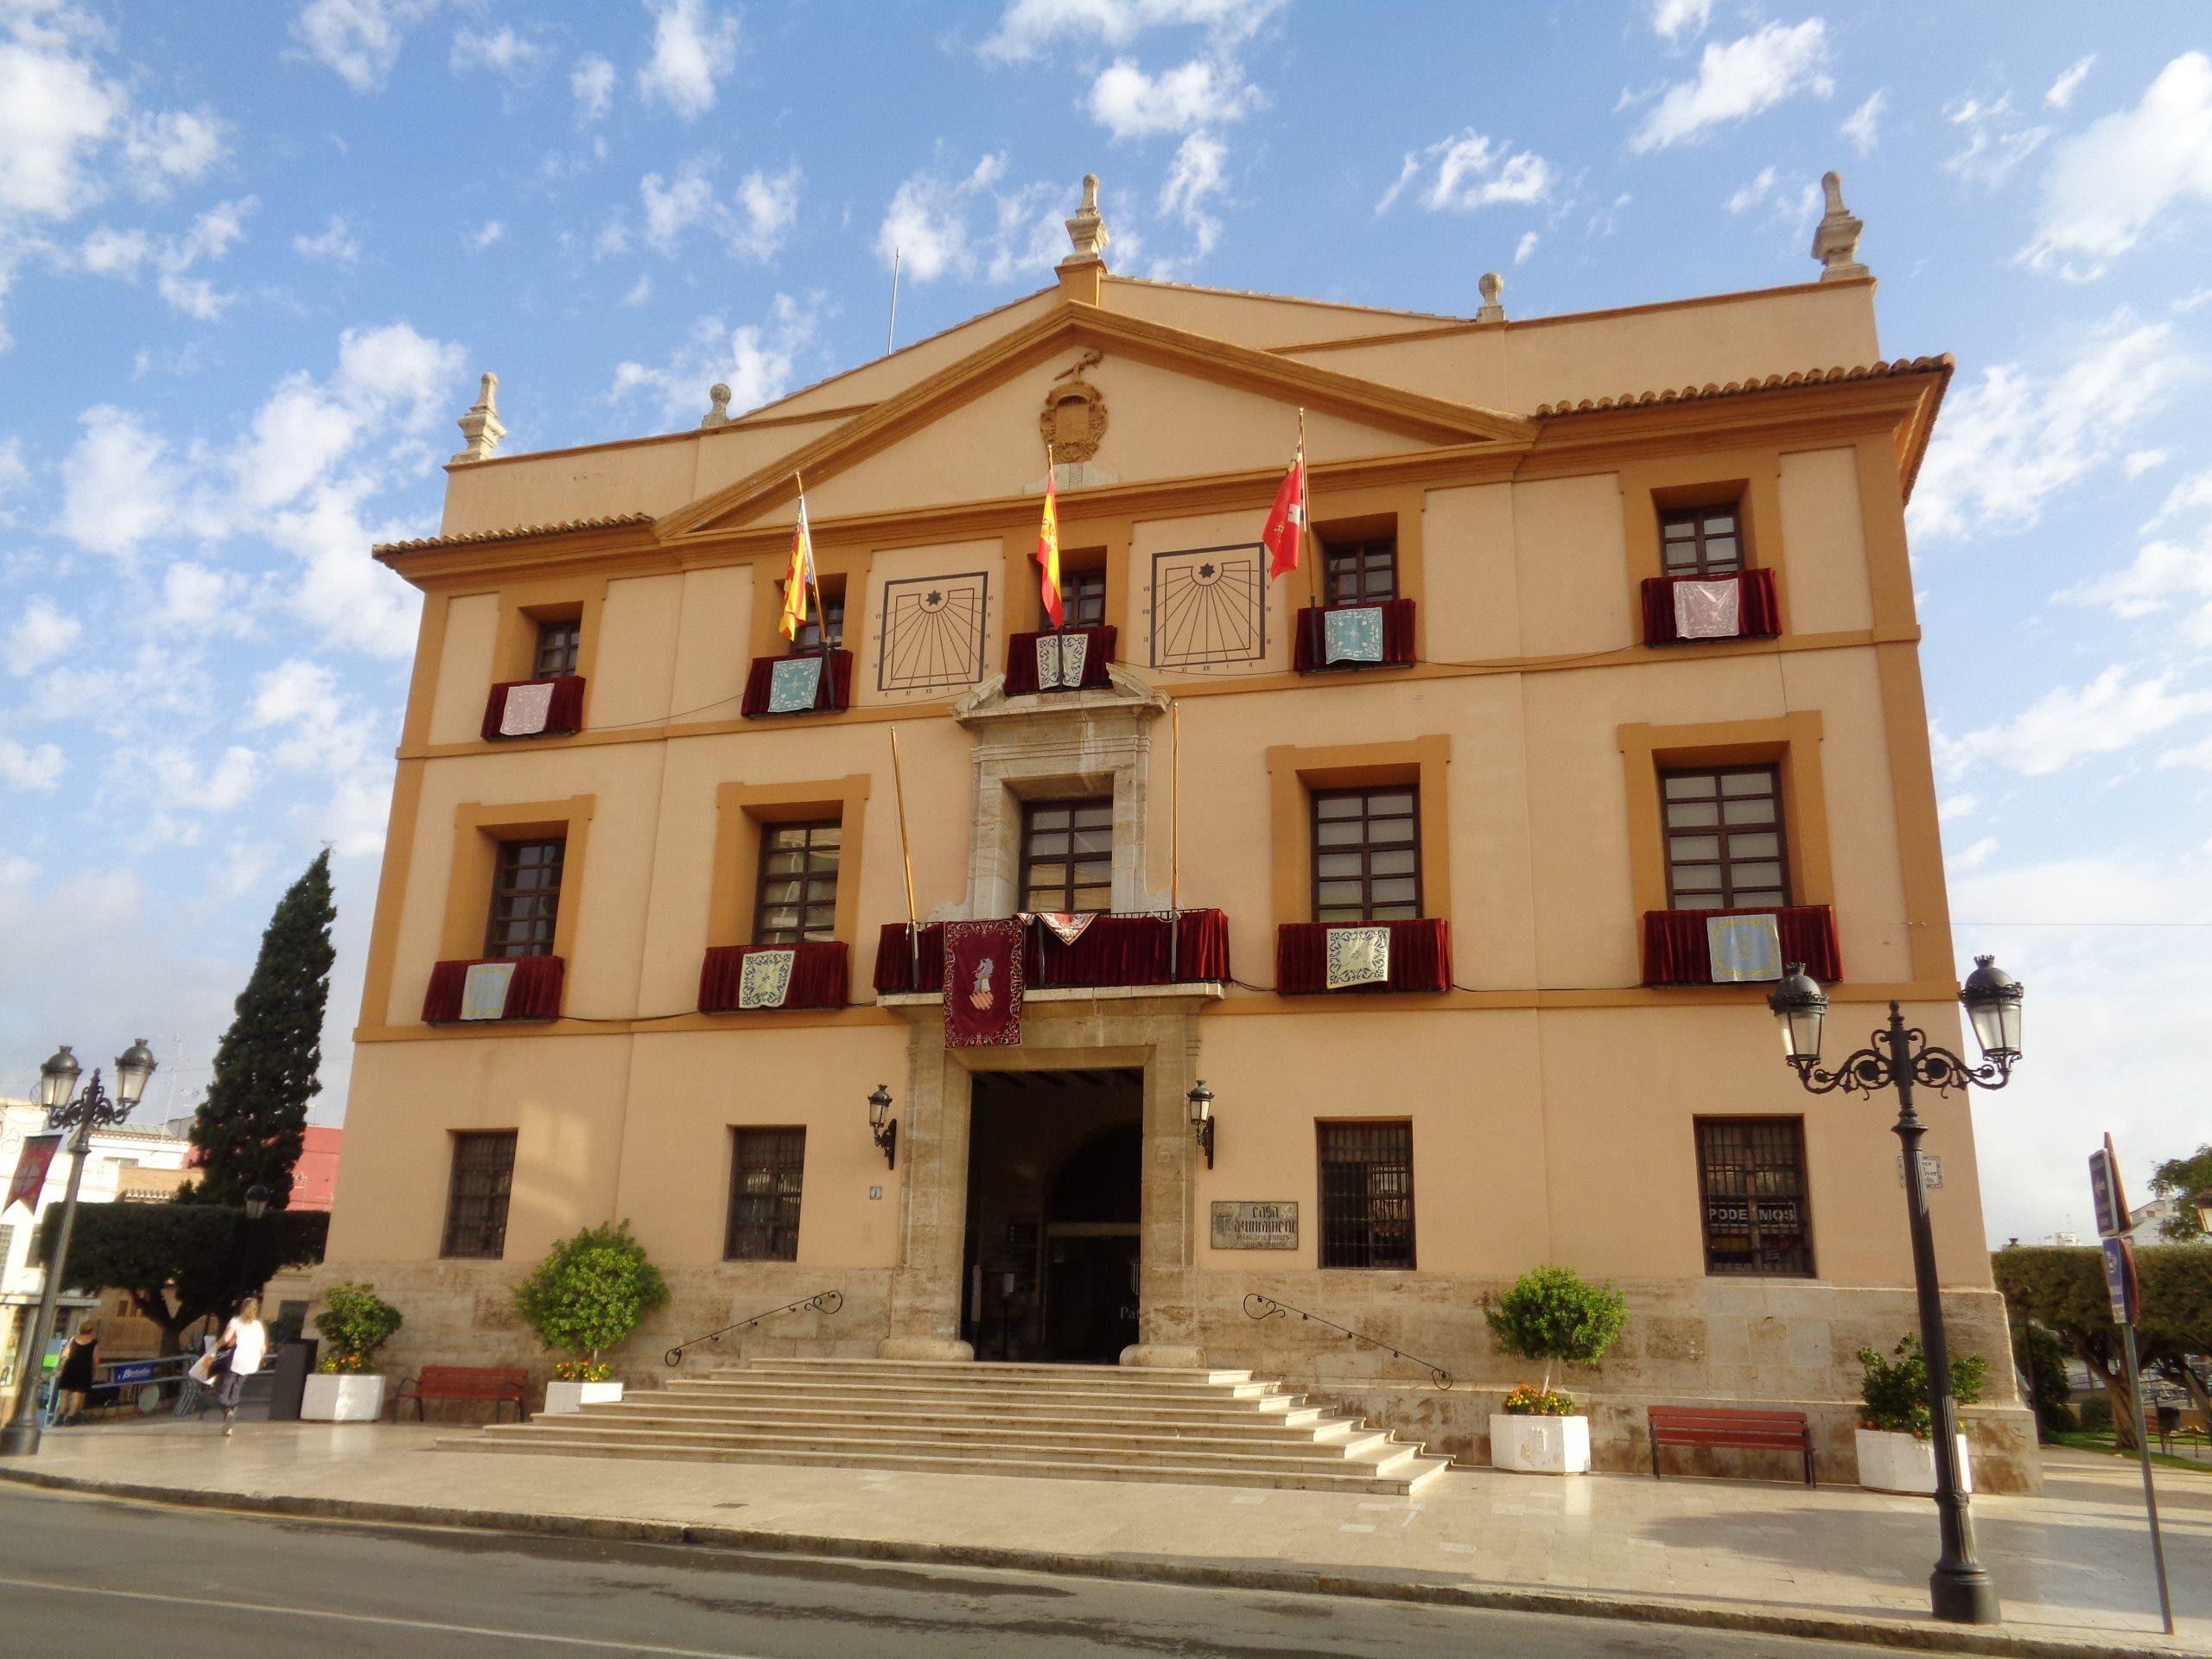 Paterna Town Hall